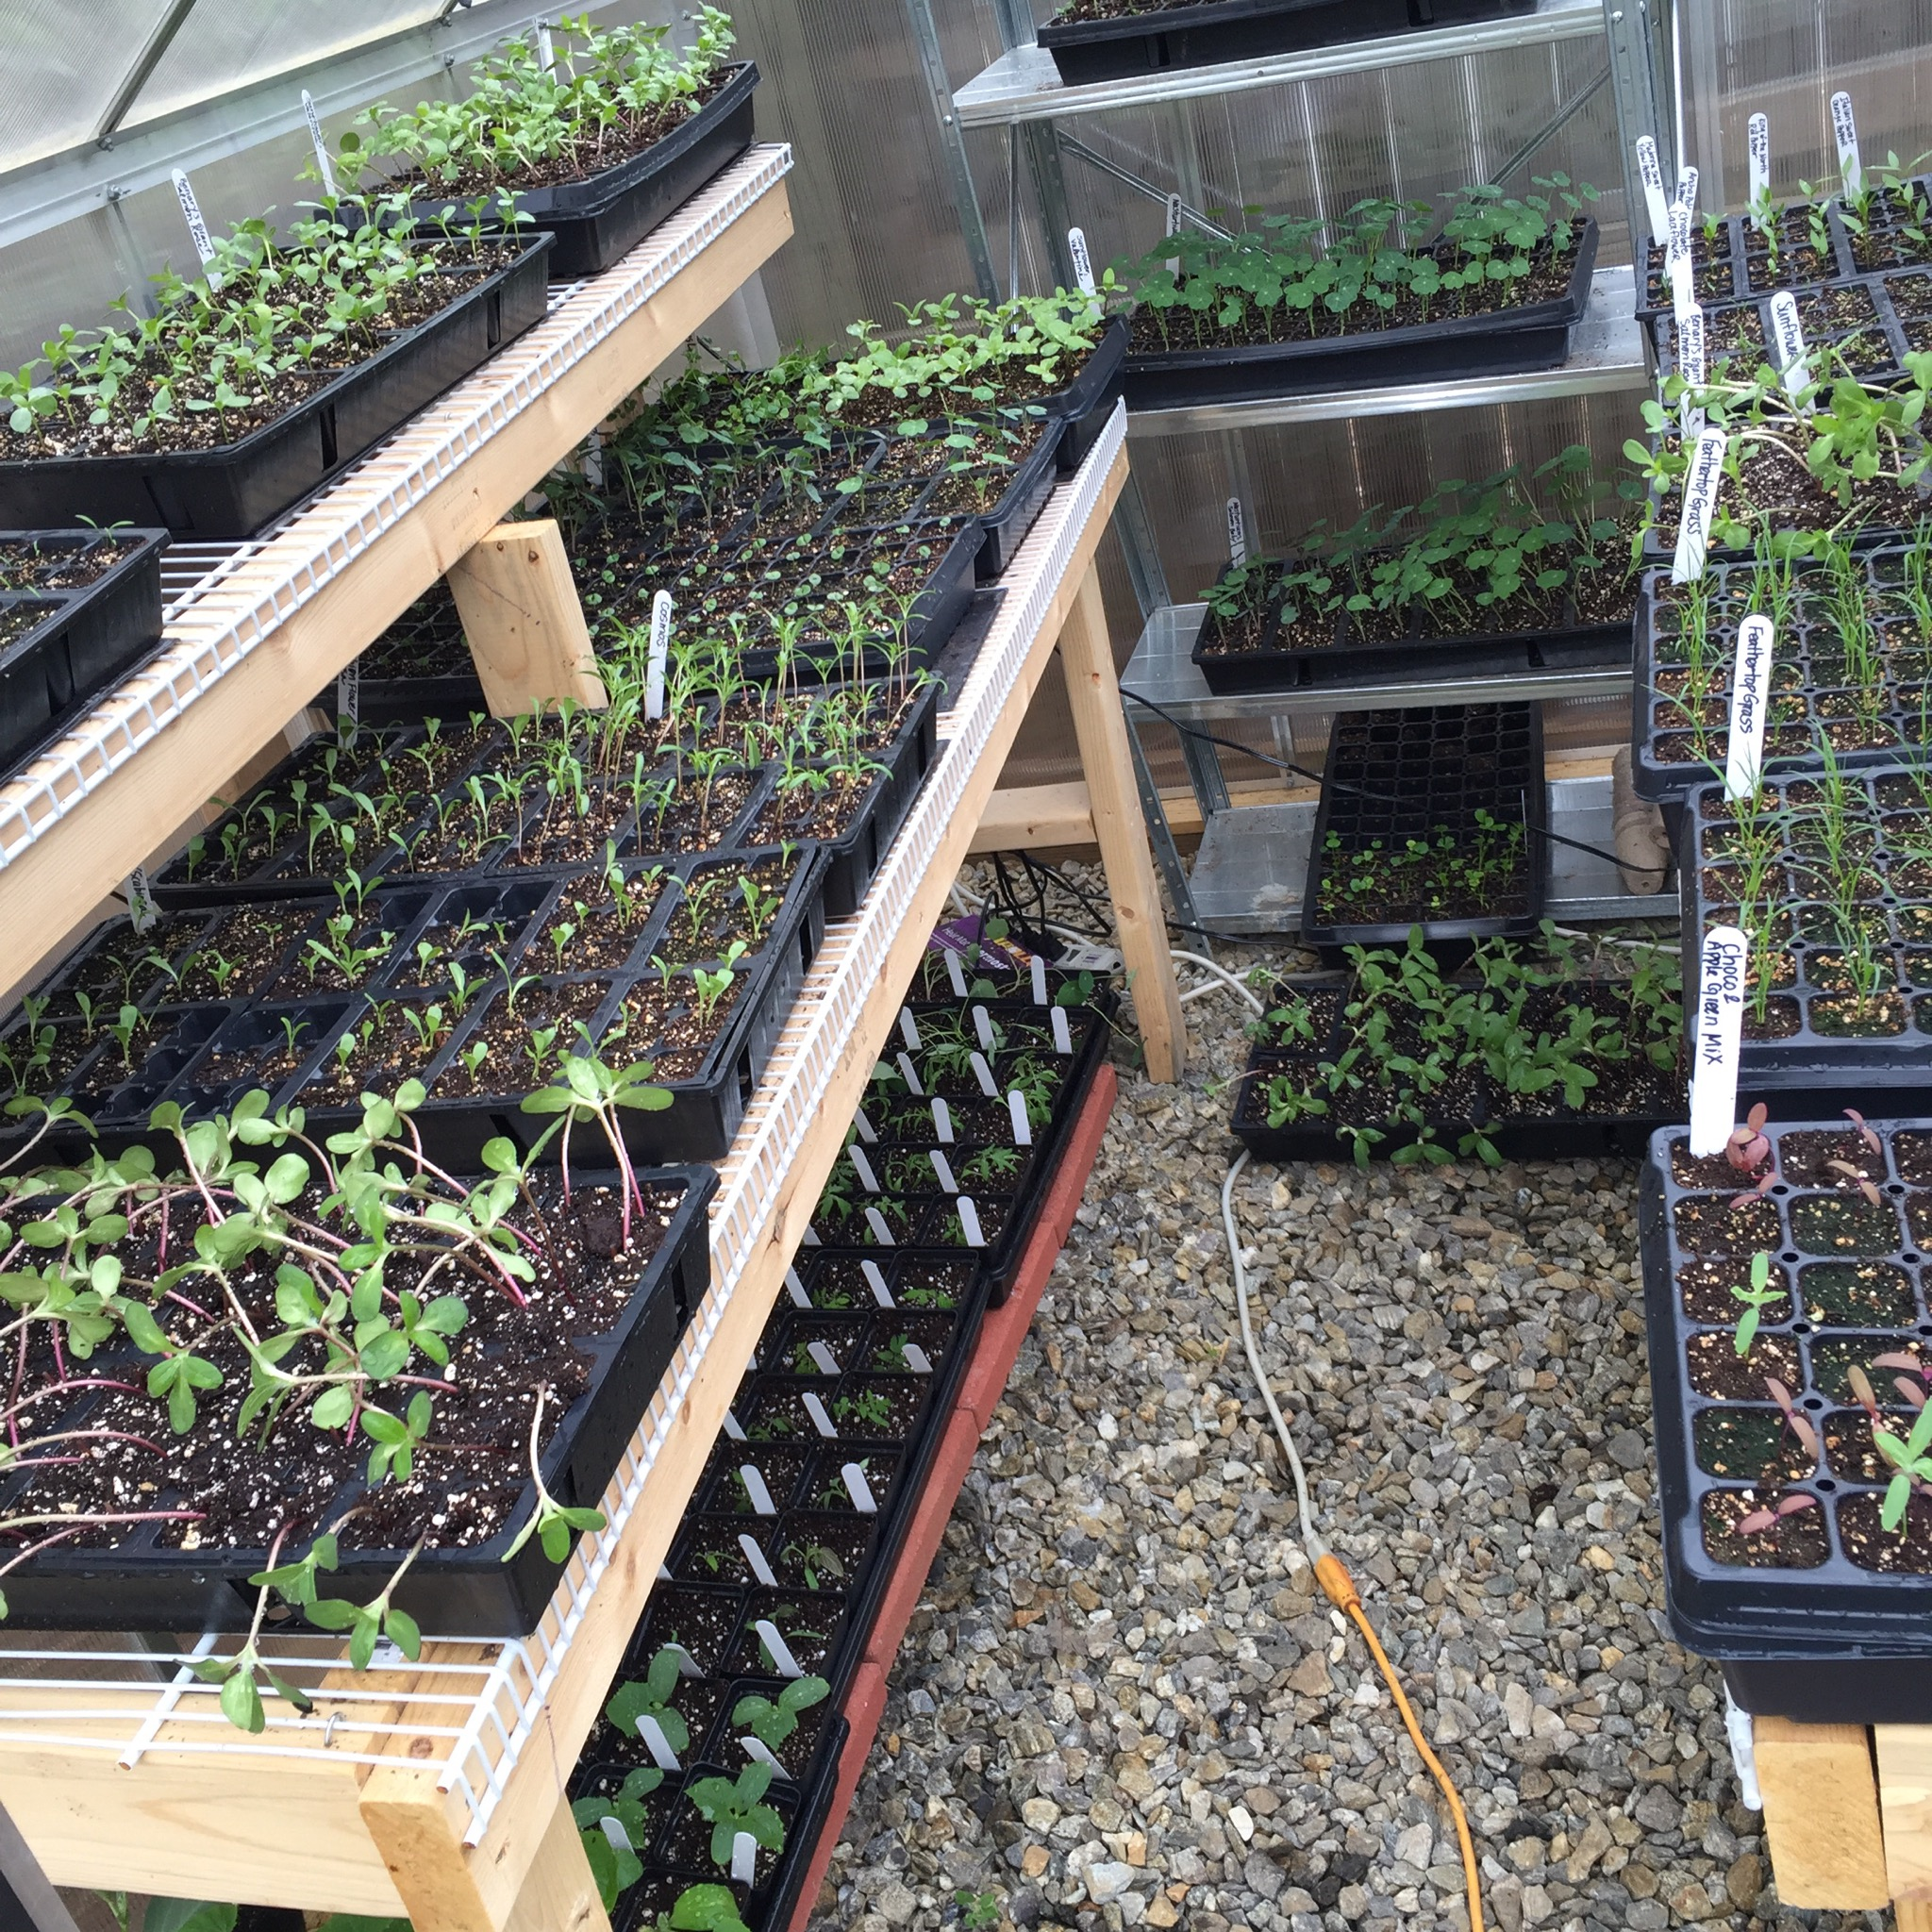 Ridiculously full mini-greenhouse